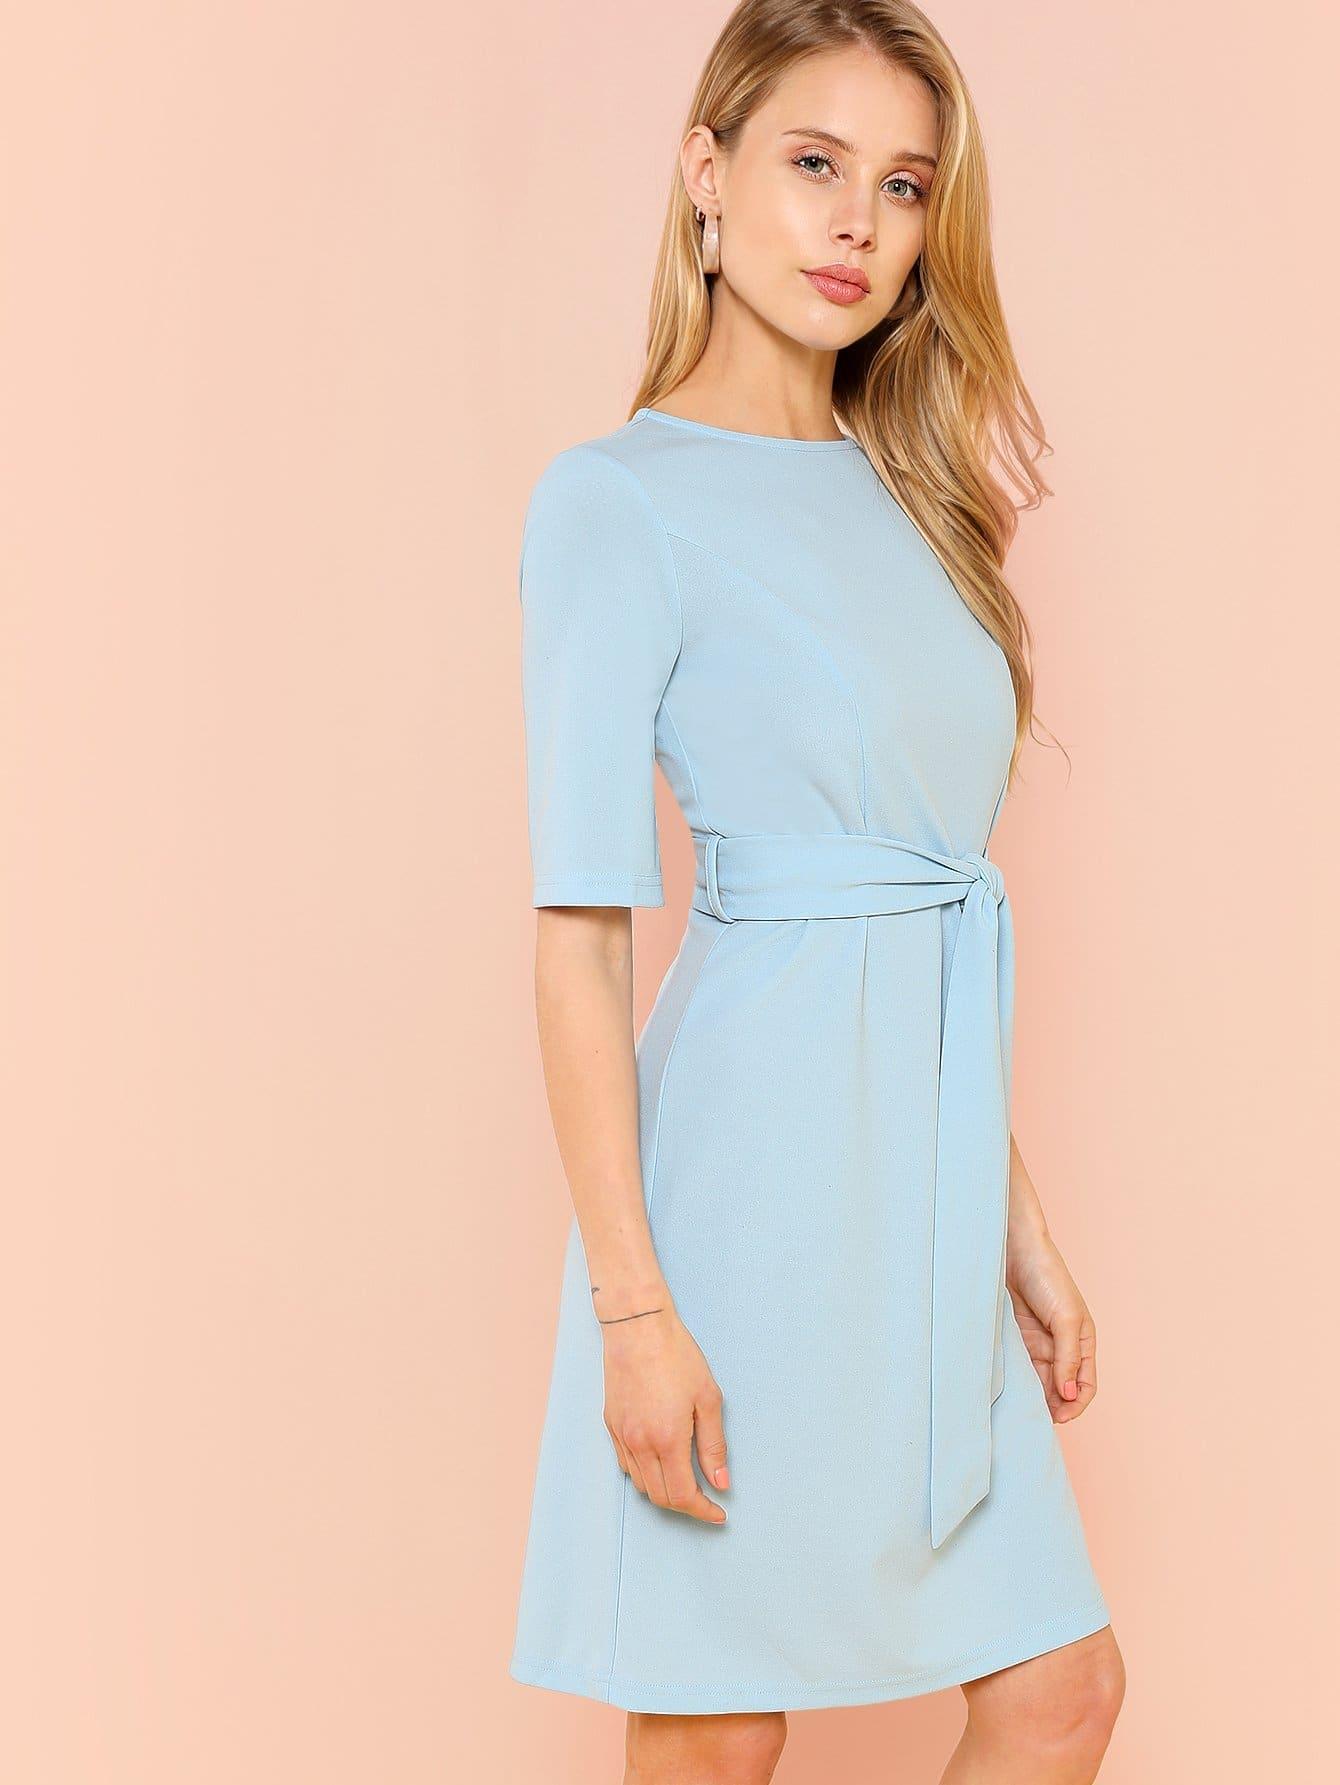 Kuwait google Halter Sequins Party Camis make you look skinny